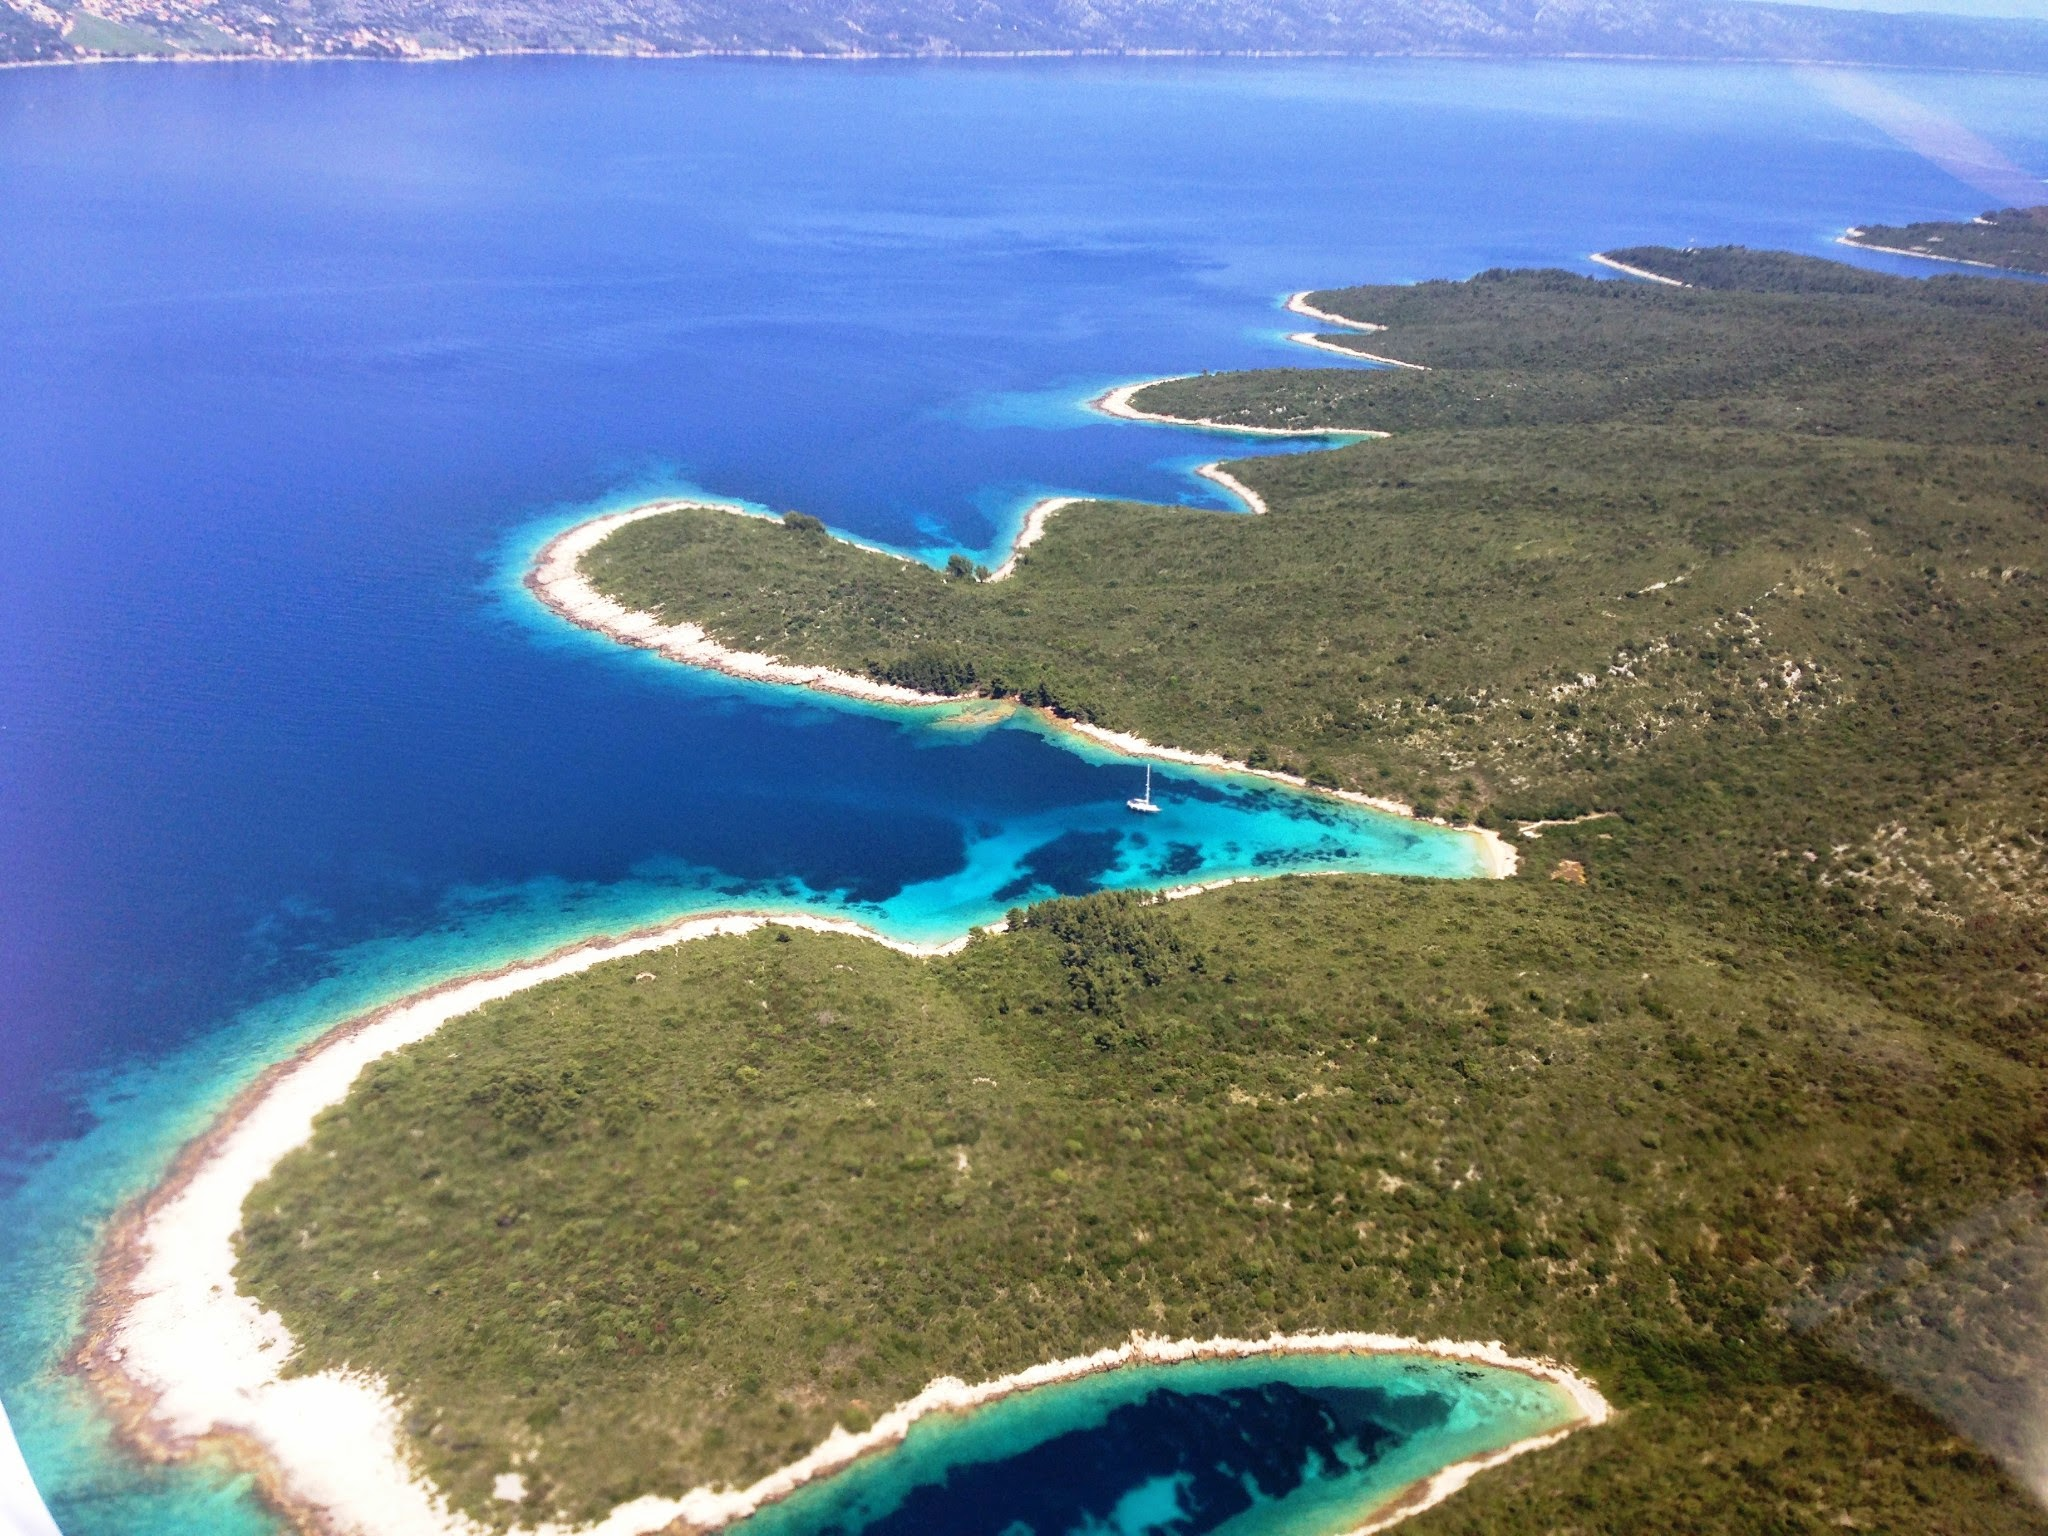 Croatia and its many islands